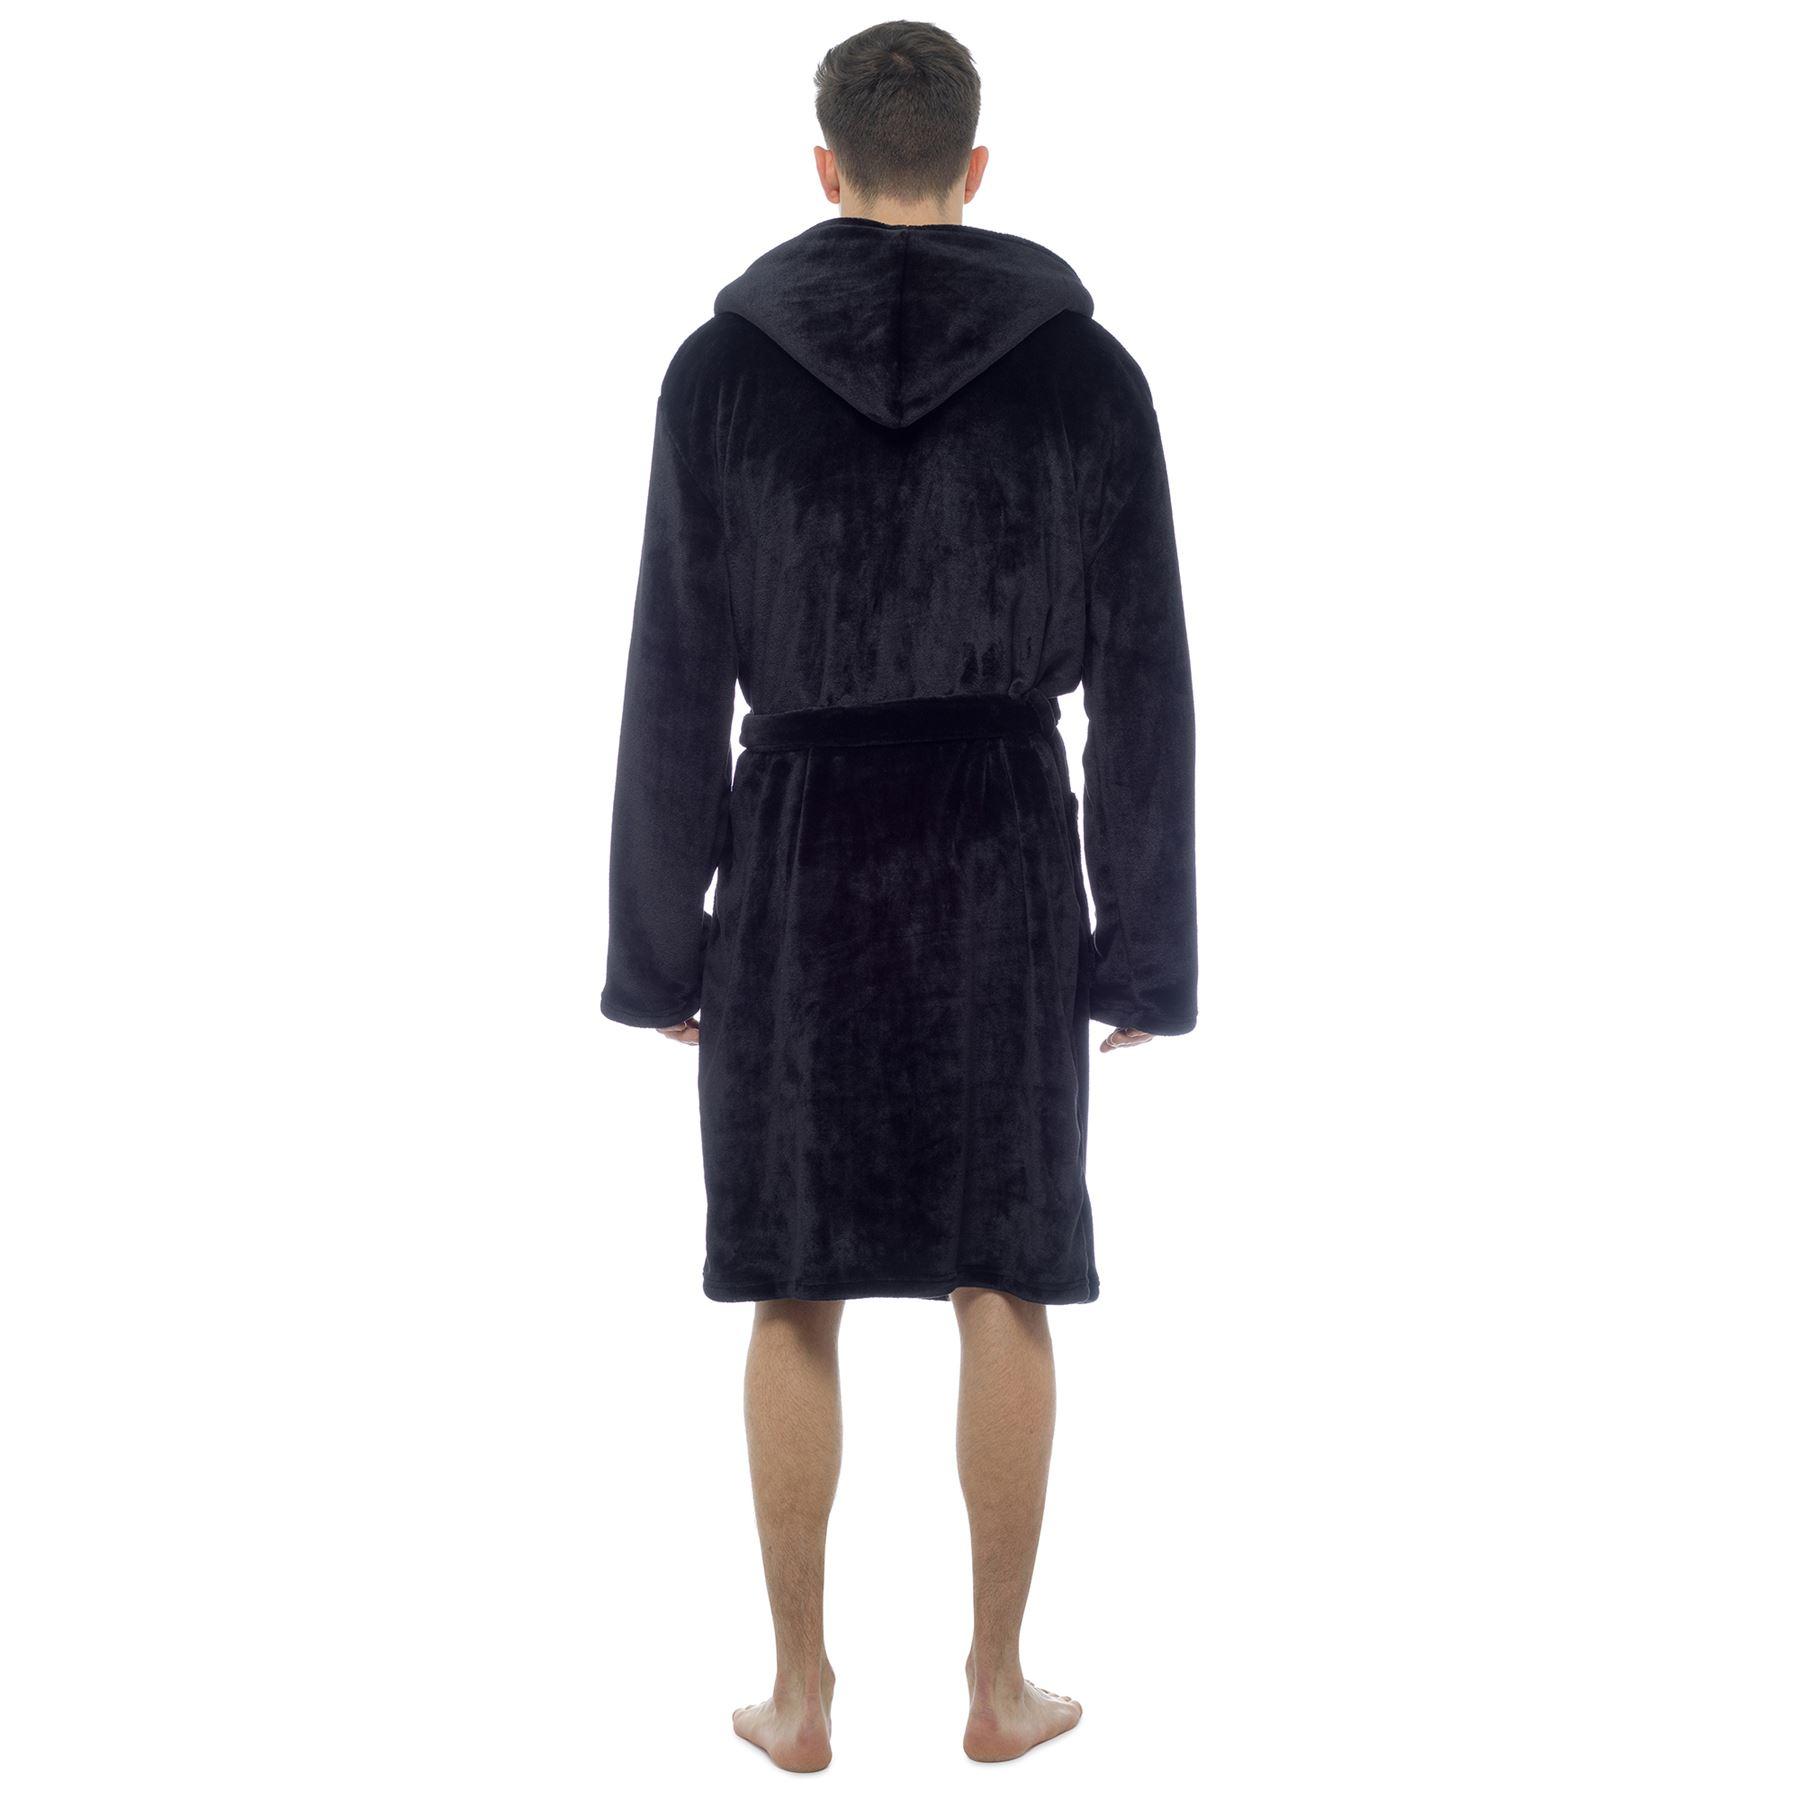 Mens luxury Hooded Shimmer Soft Fleece Dressing Gown Bathrobe ... ab3ef91ee